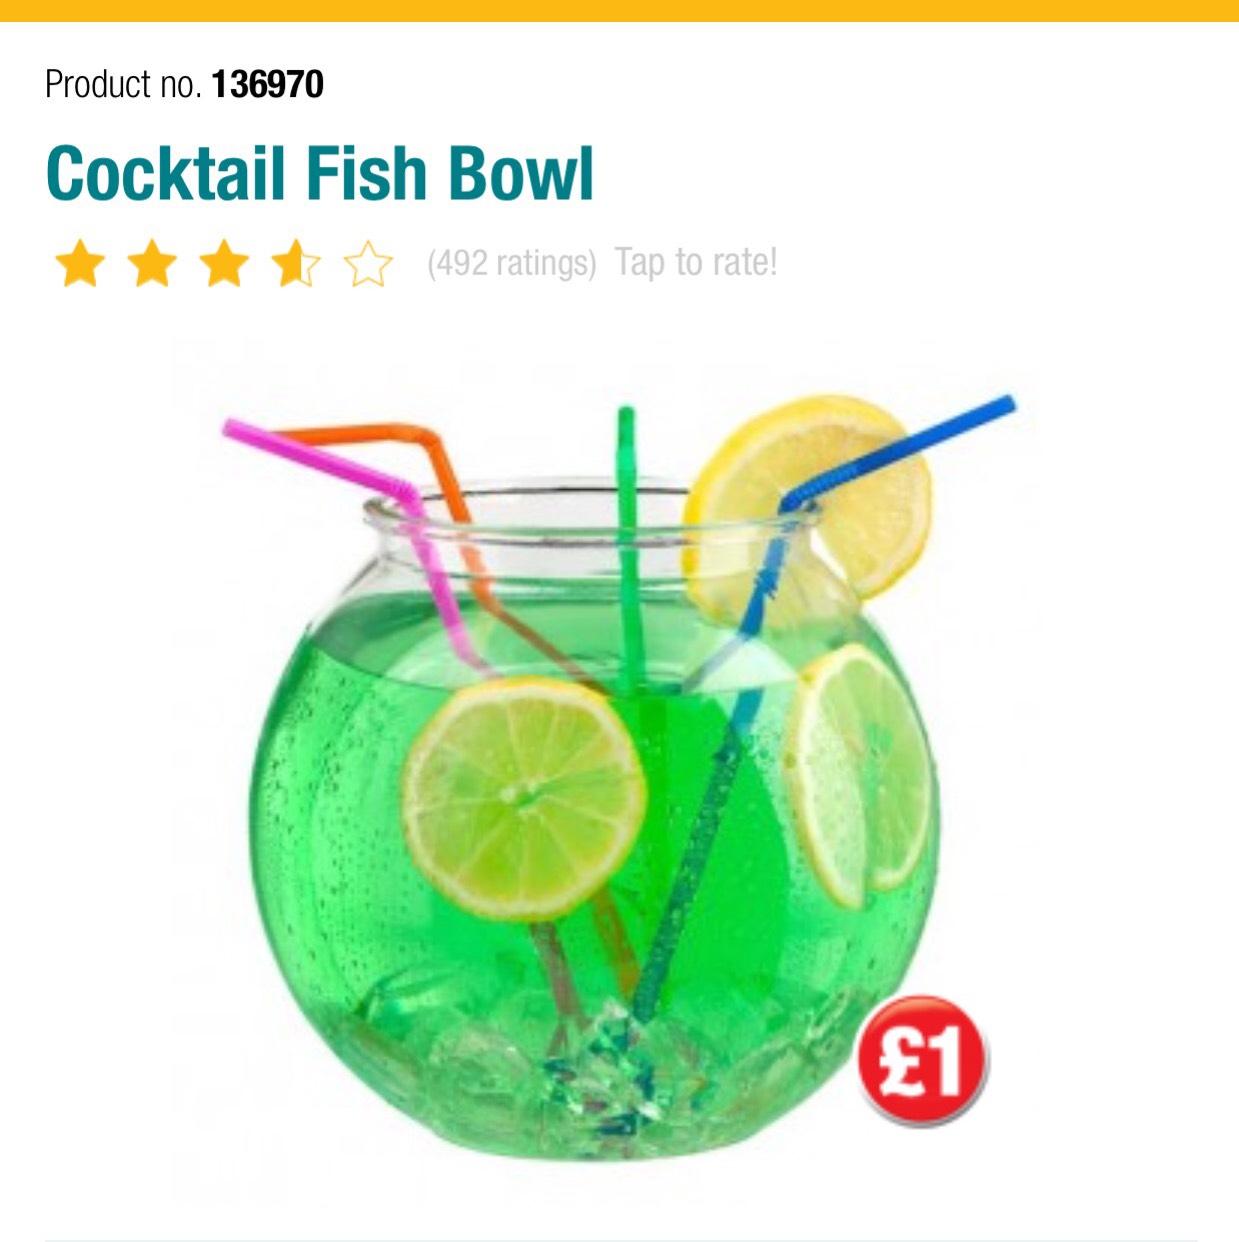 Cocktail Fish Bowl - £1 @ Poundland